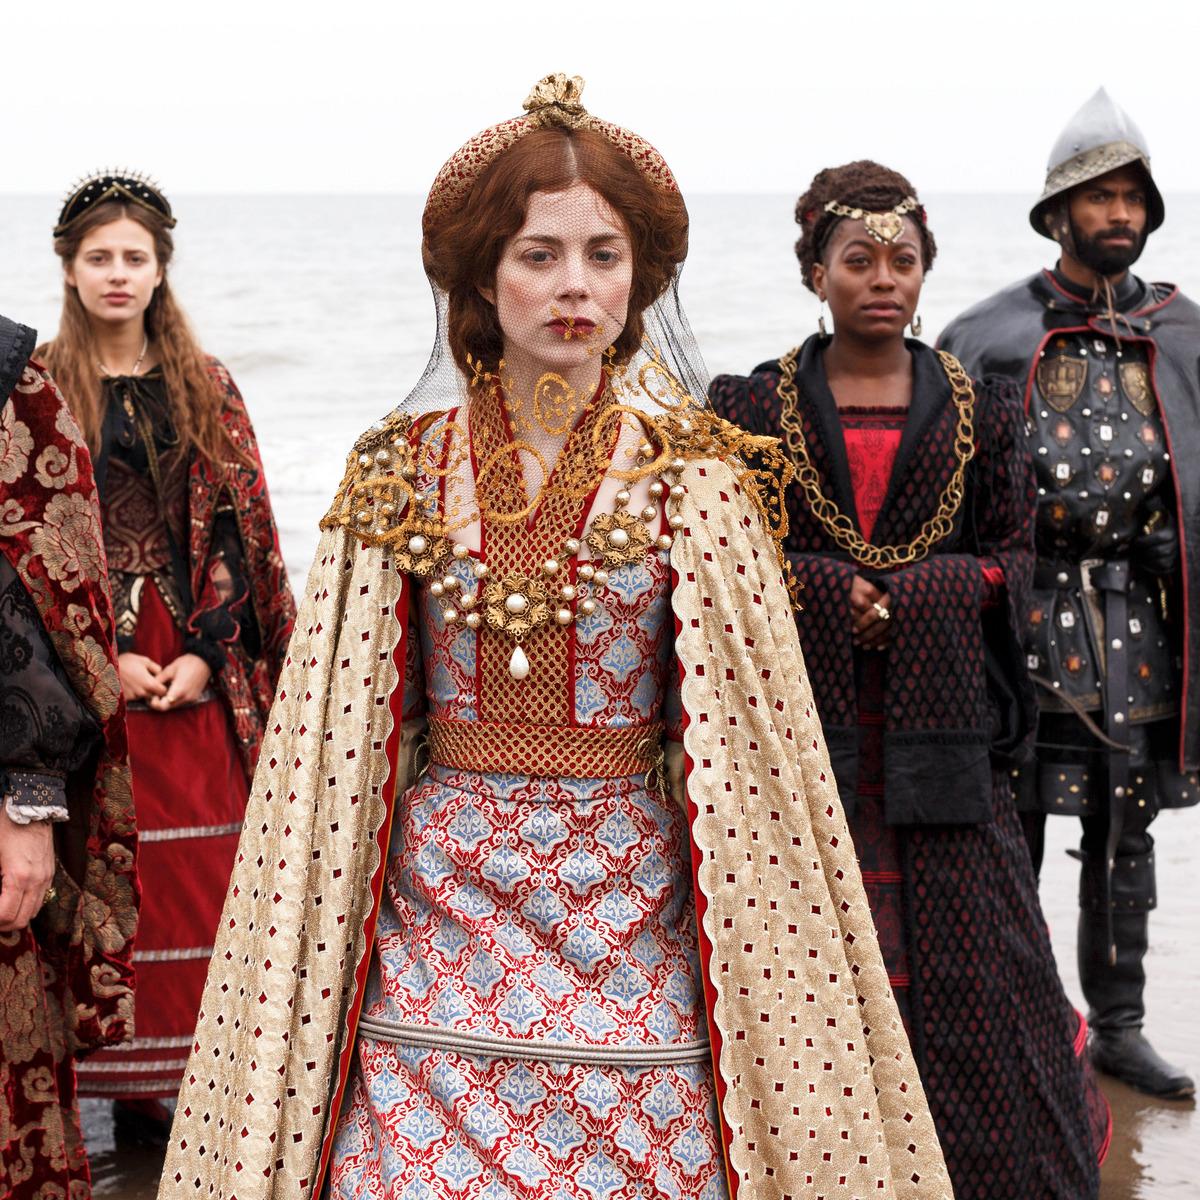 The Spanish Princess' Review